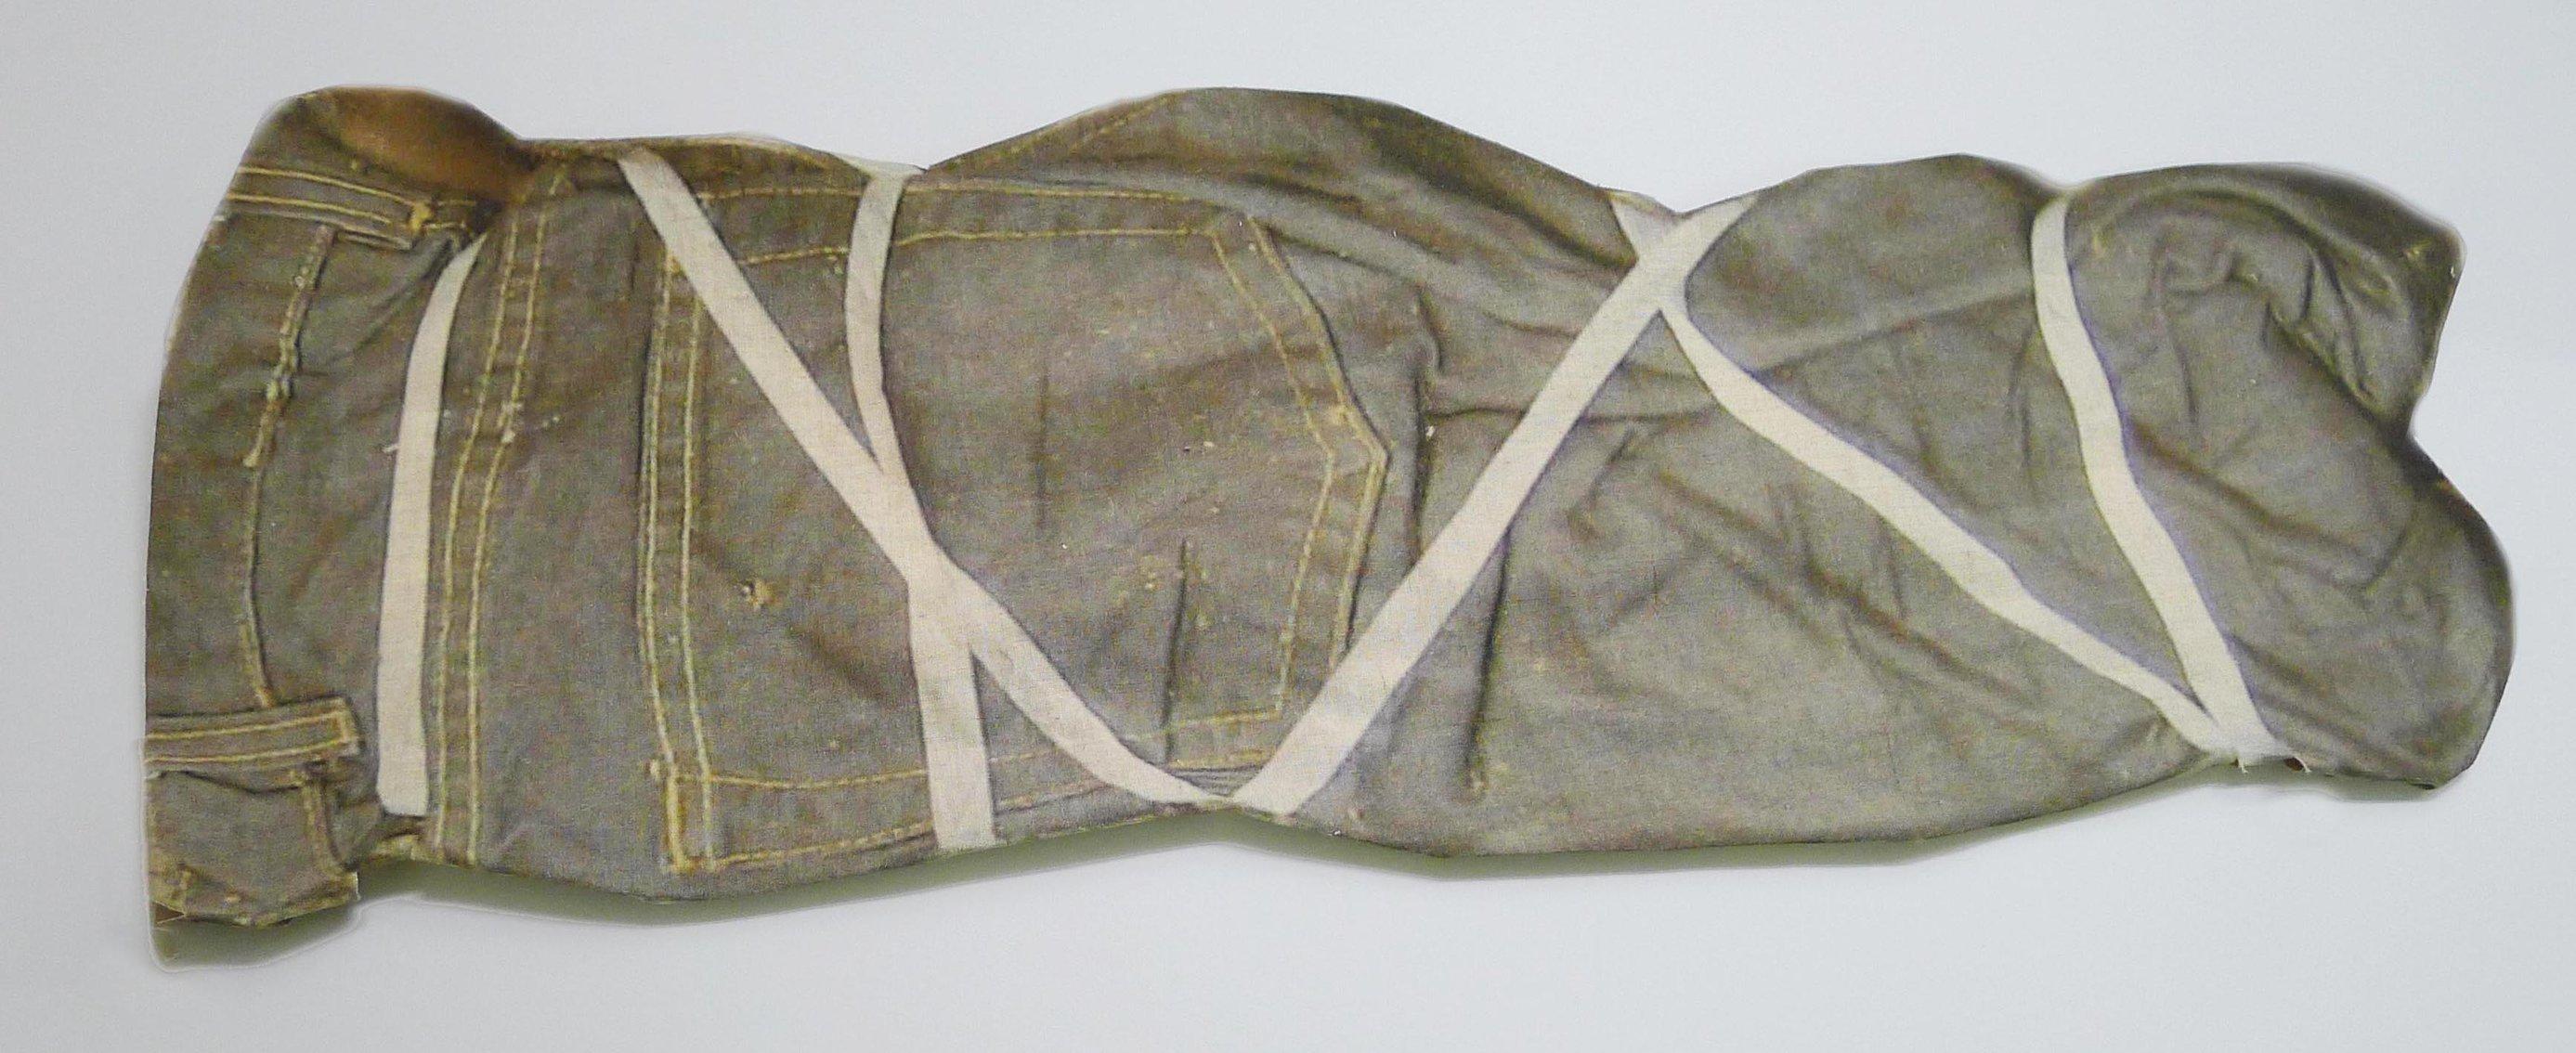 Ellert Haitjema, Wet Pants, 2014